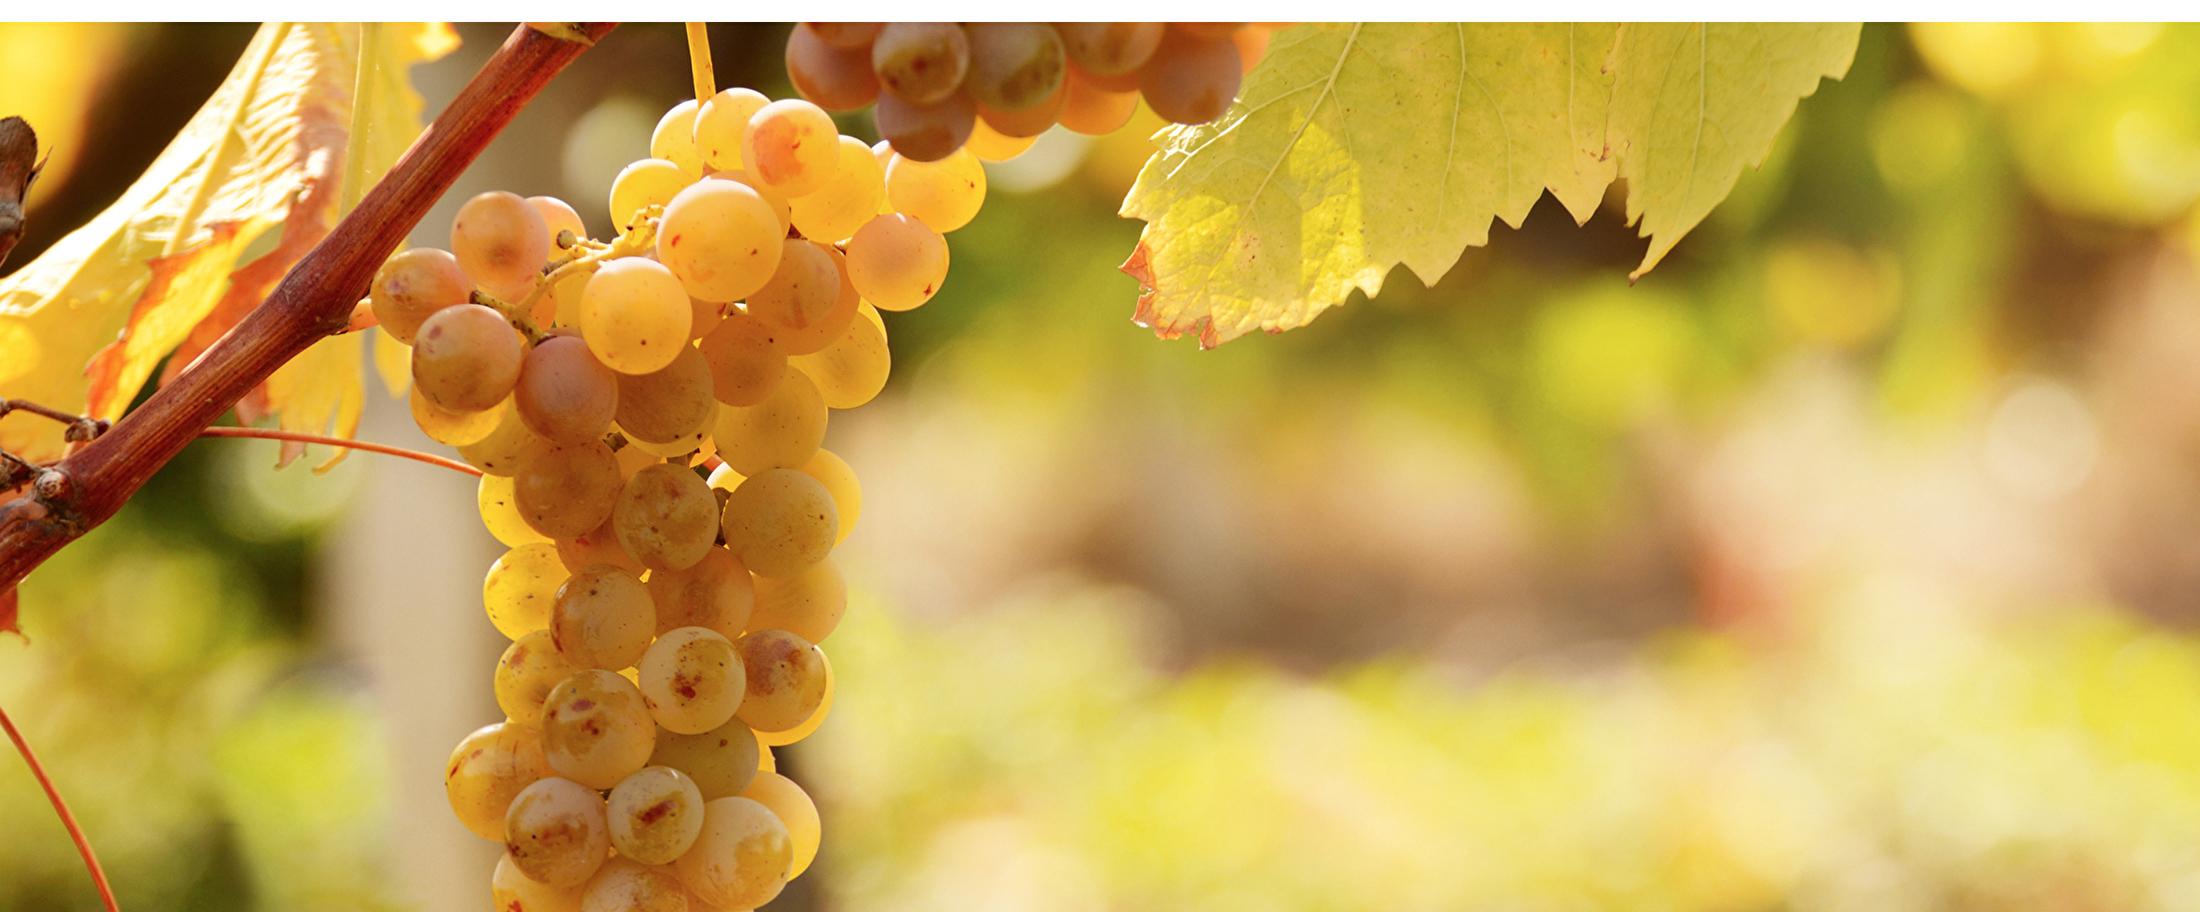 Vino Linea Directa_Druivensoort Pinot Grigio